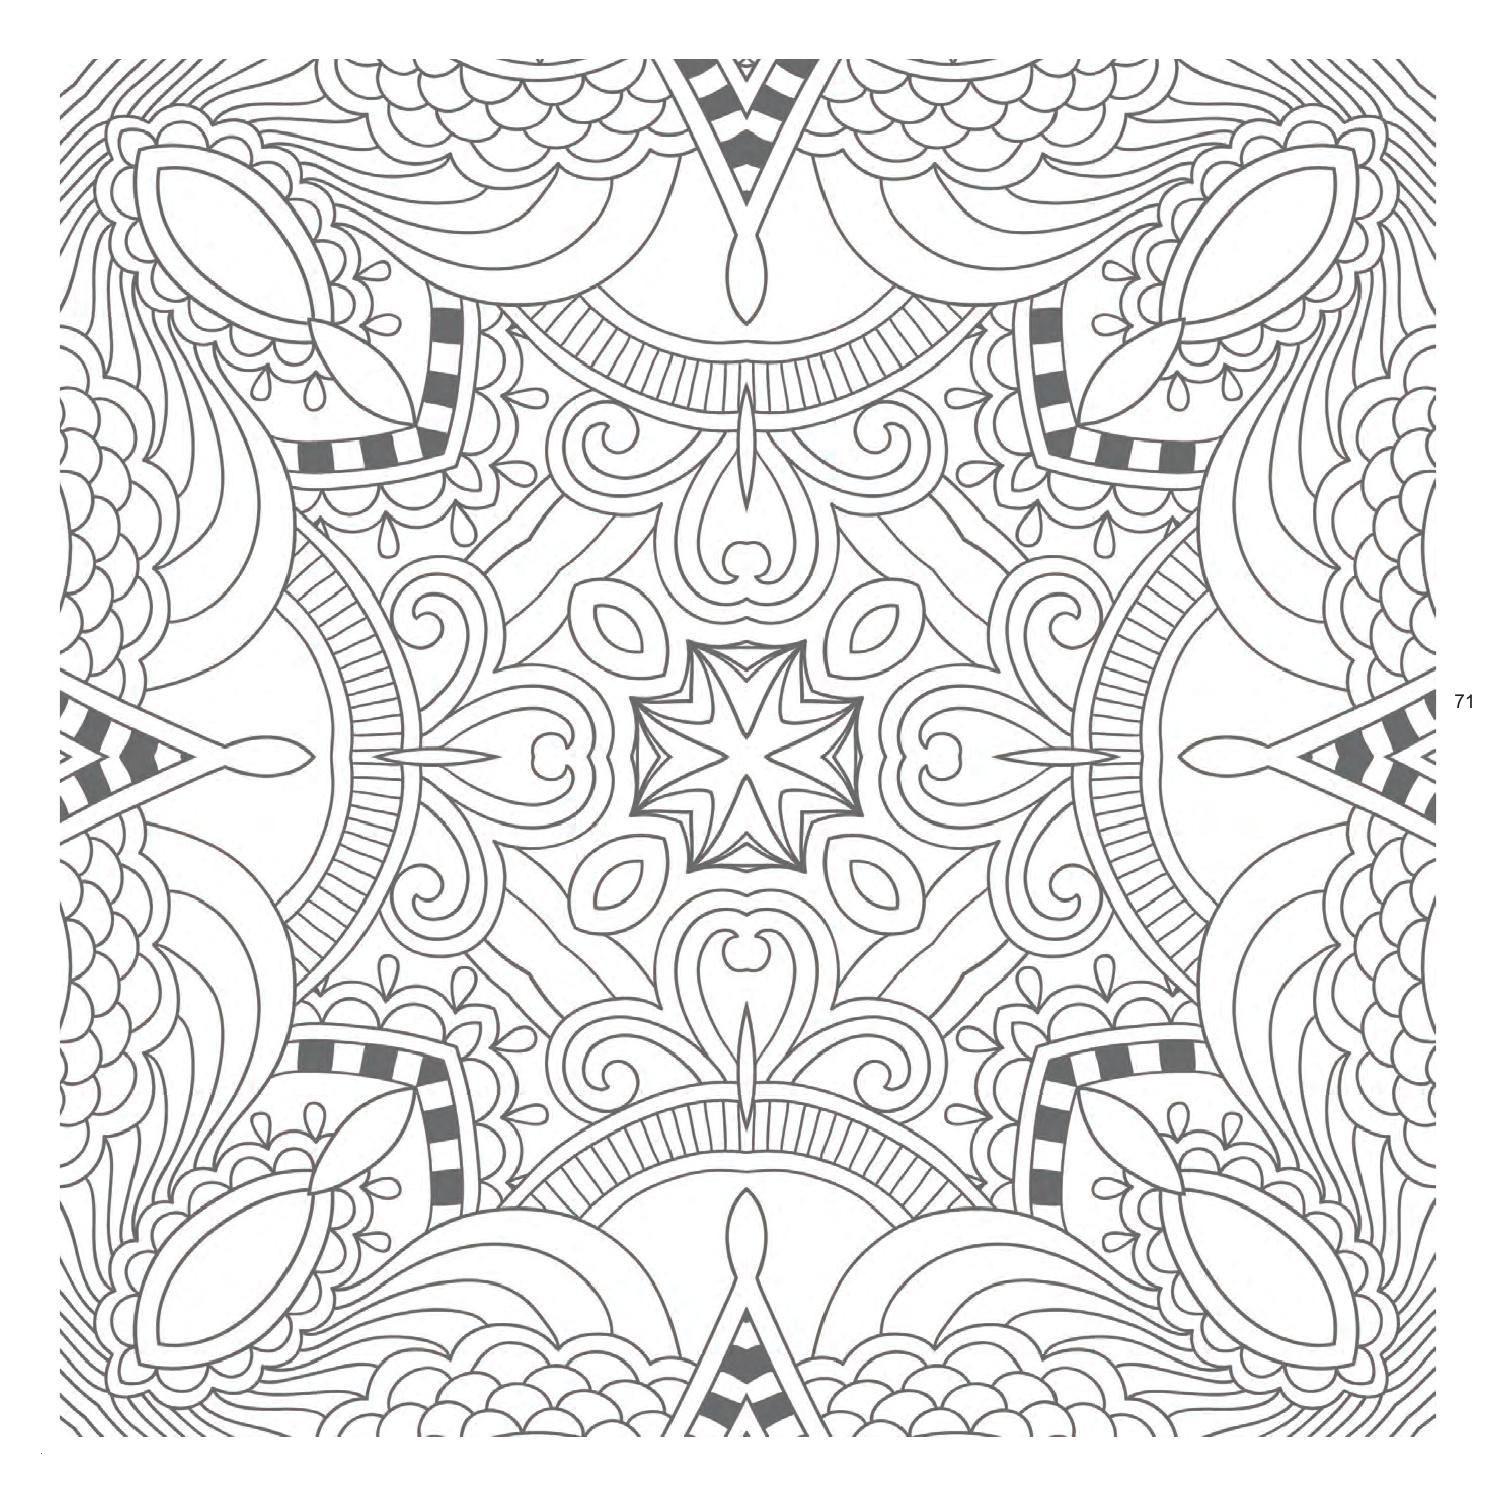 Ausmalbilder Weihnachten Mandala Genial Ausmalbilder Weihnachten Mandala Inspirierend 25 Gut Aussehend Fotografieren